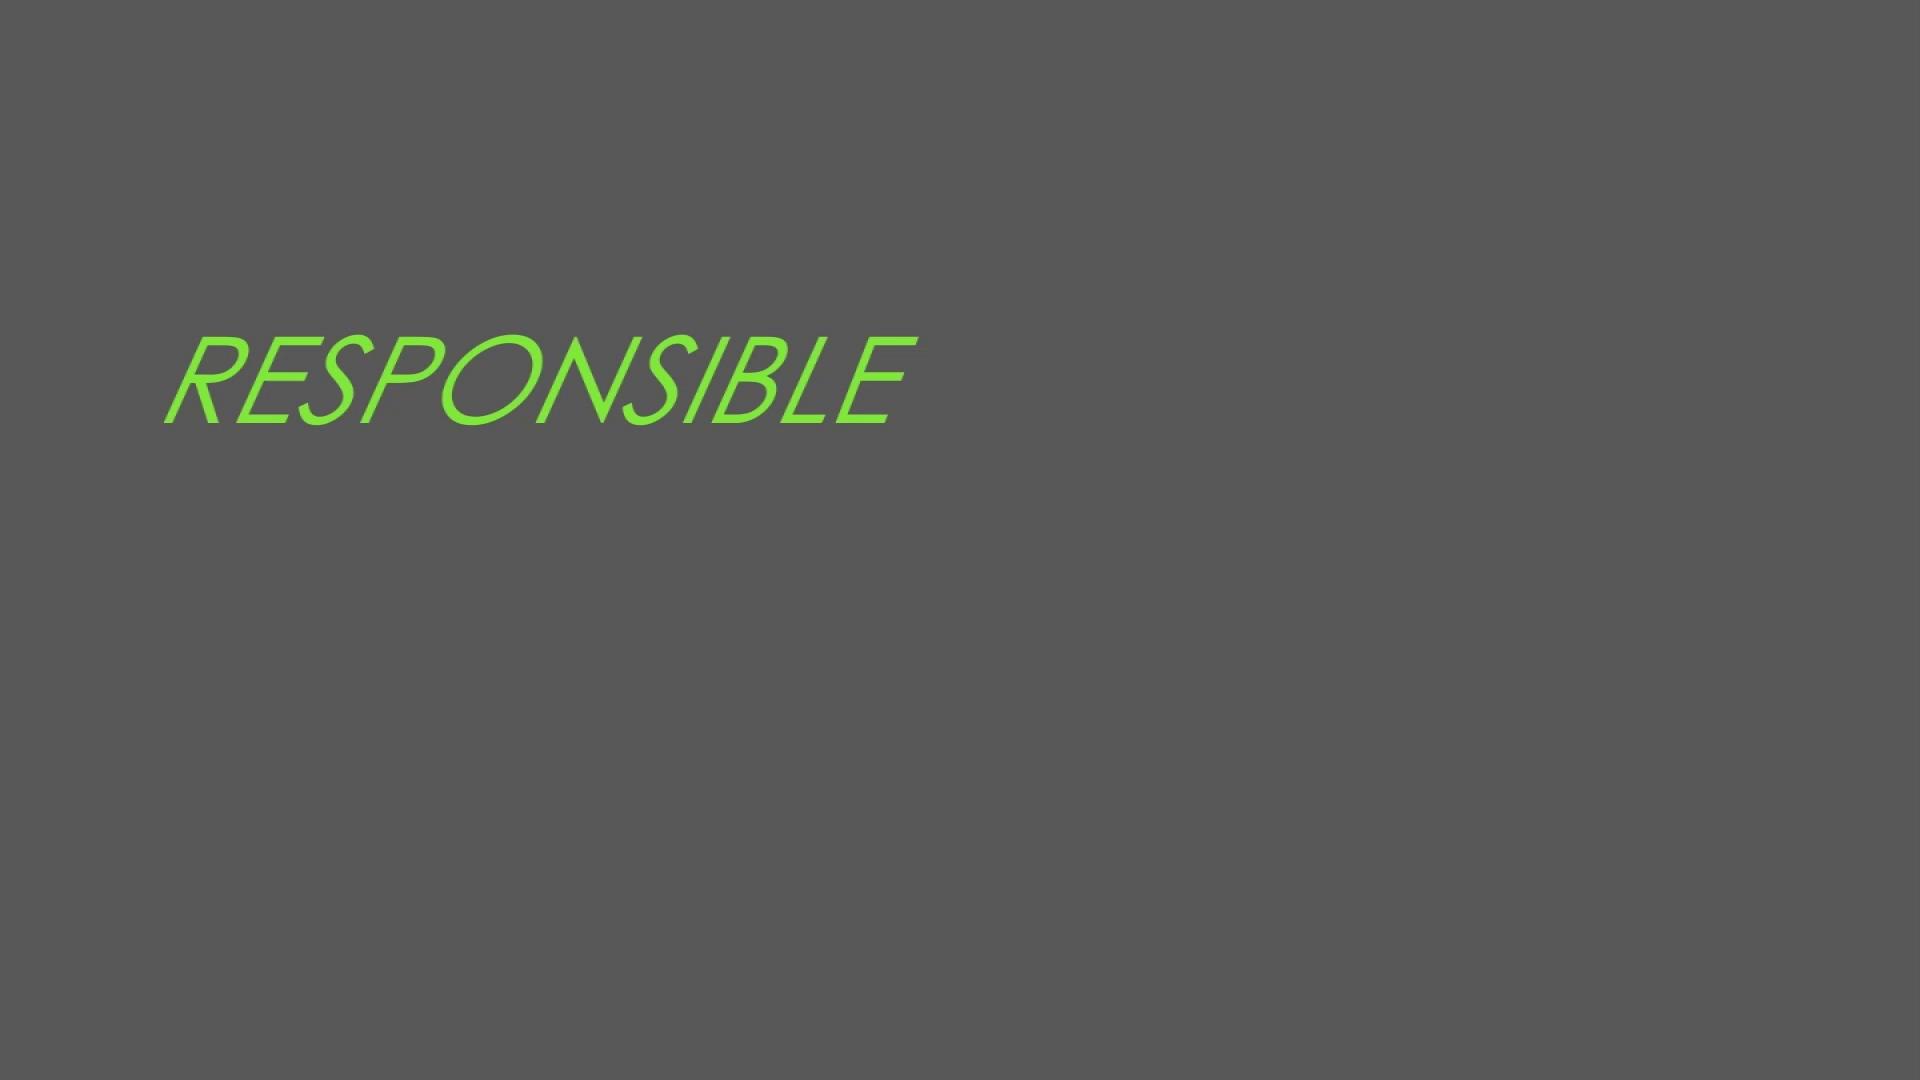 Introduction to MOOC Responsible Entrepreneurship